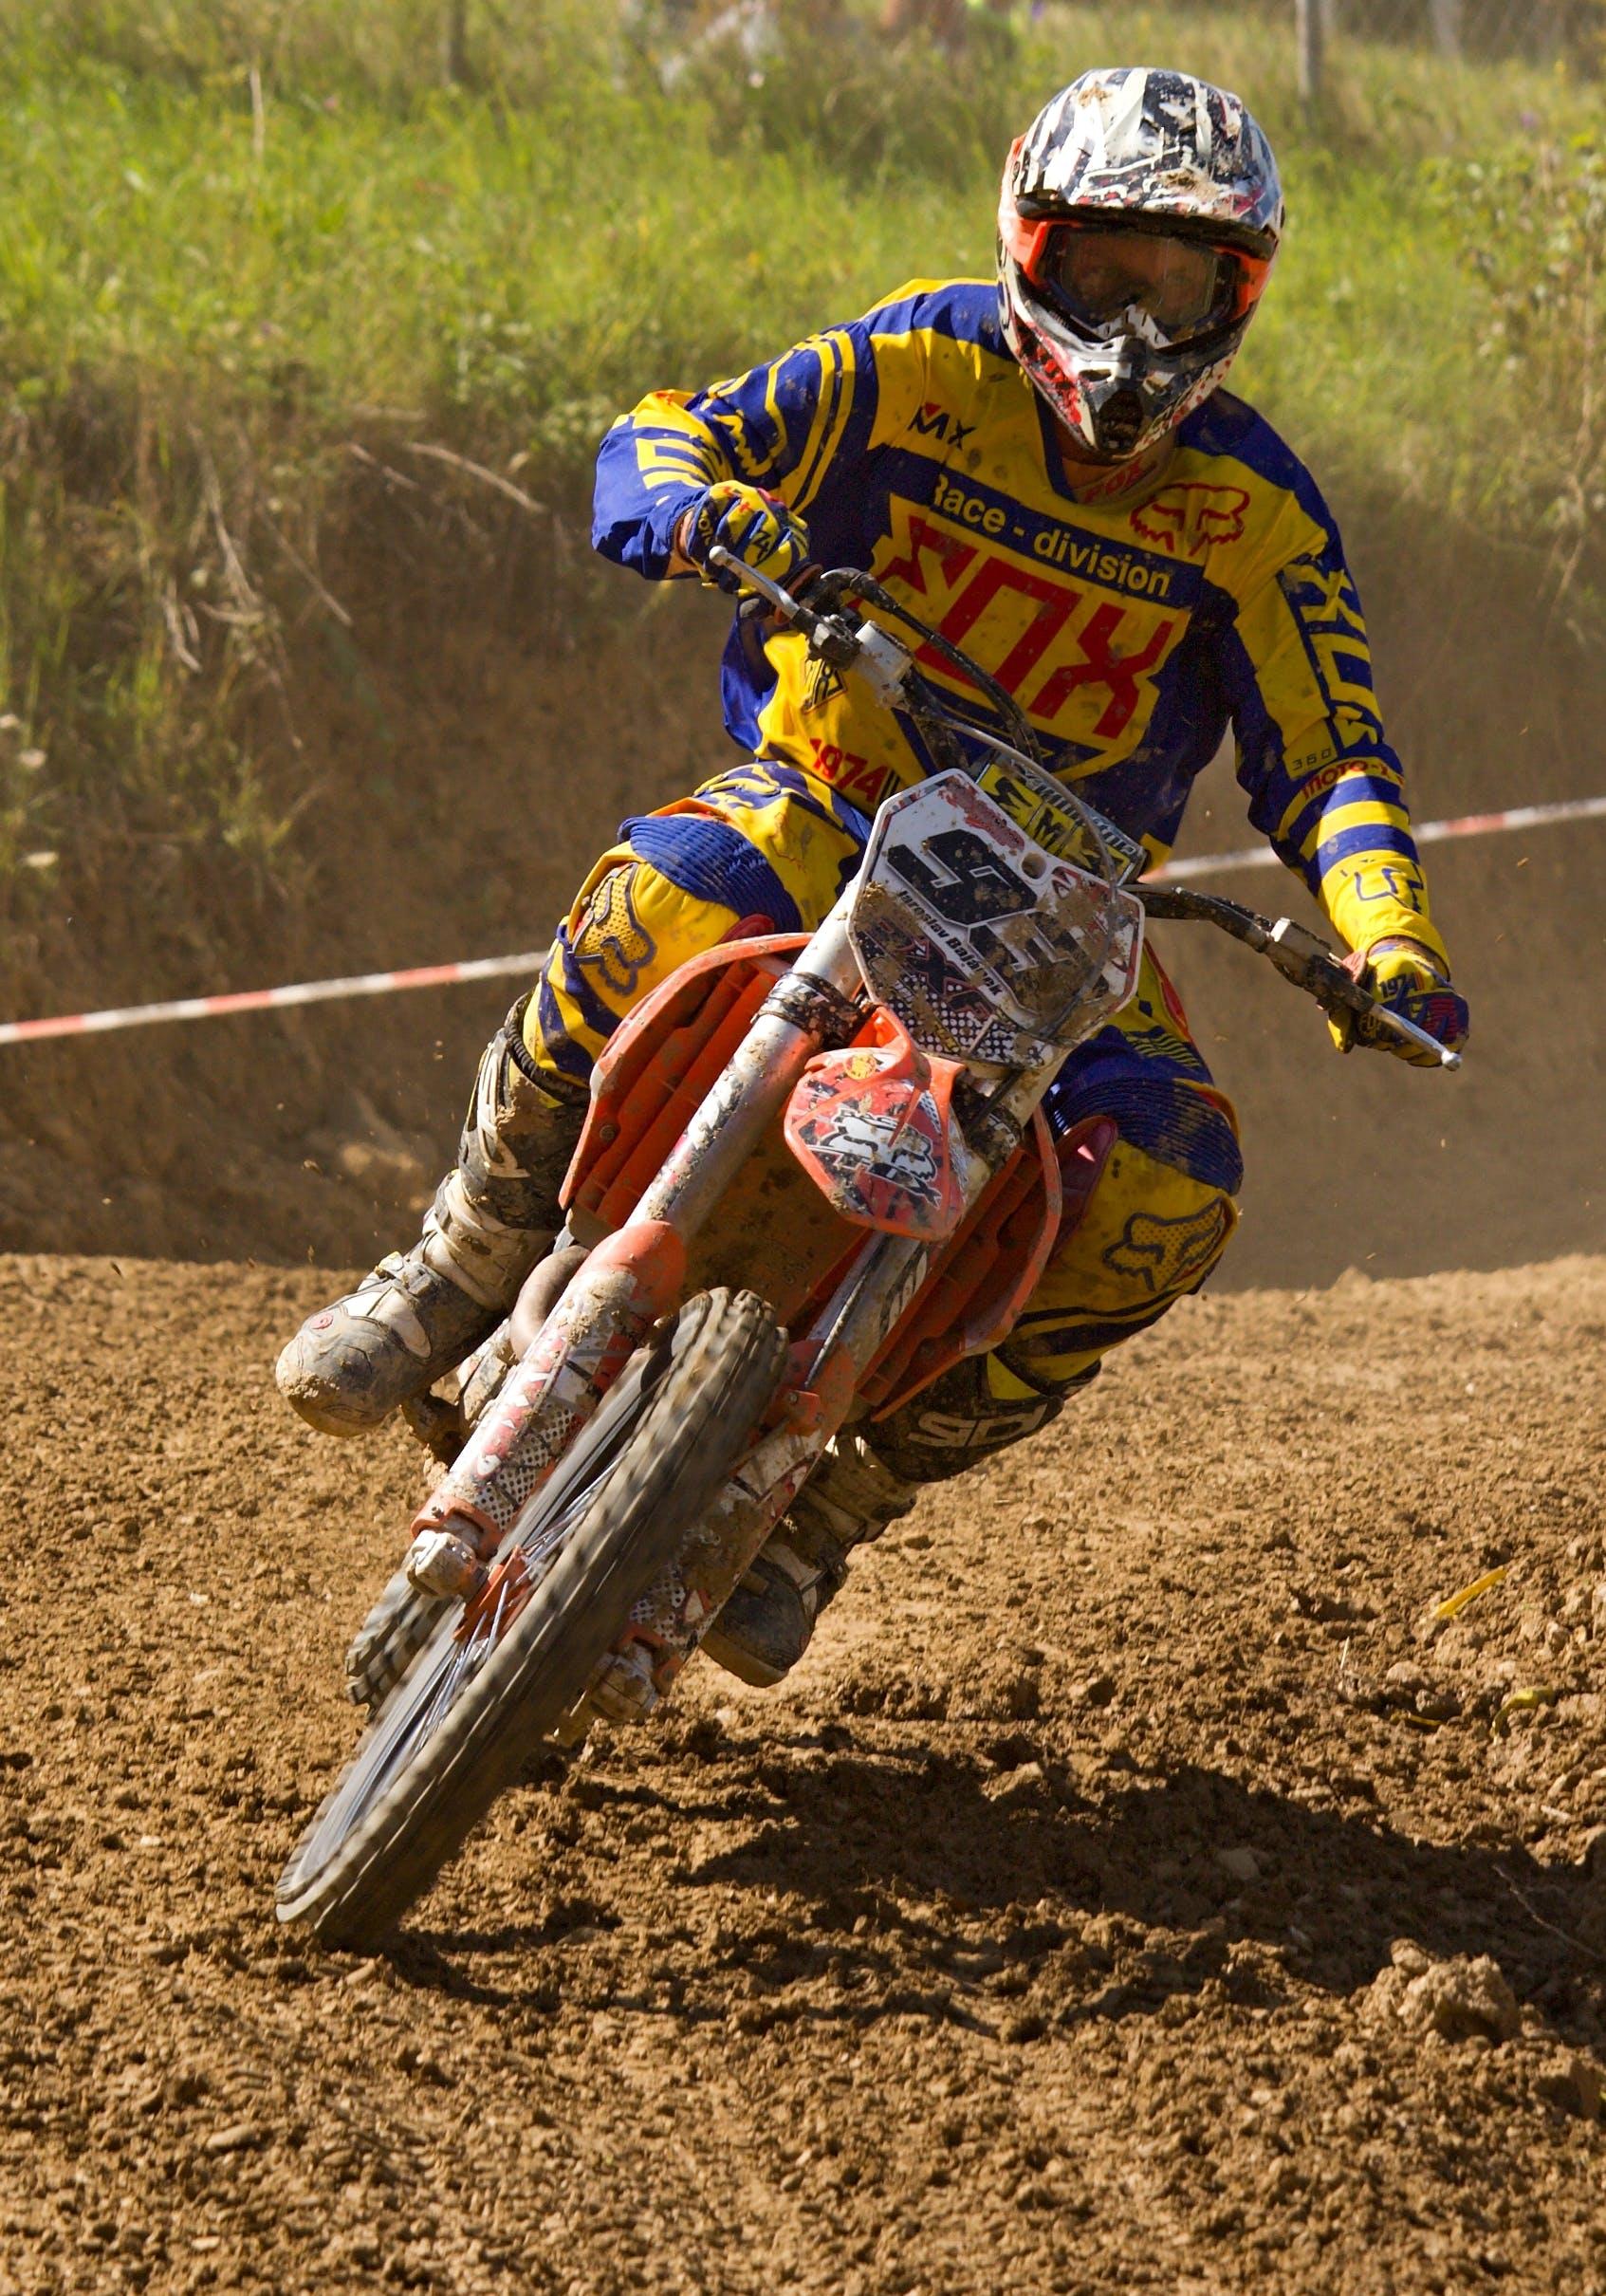 Gratis lagerfoto af fart, motocross, motorcykel, motorcykelræs